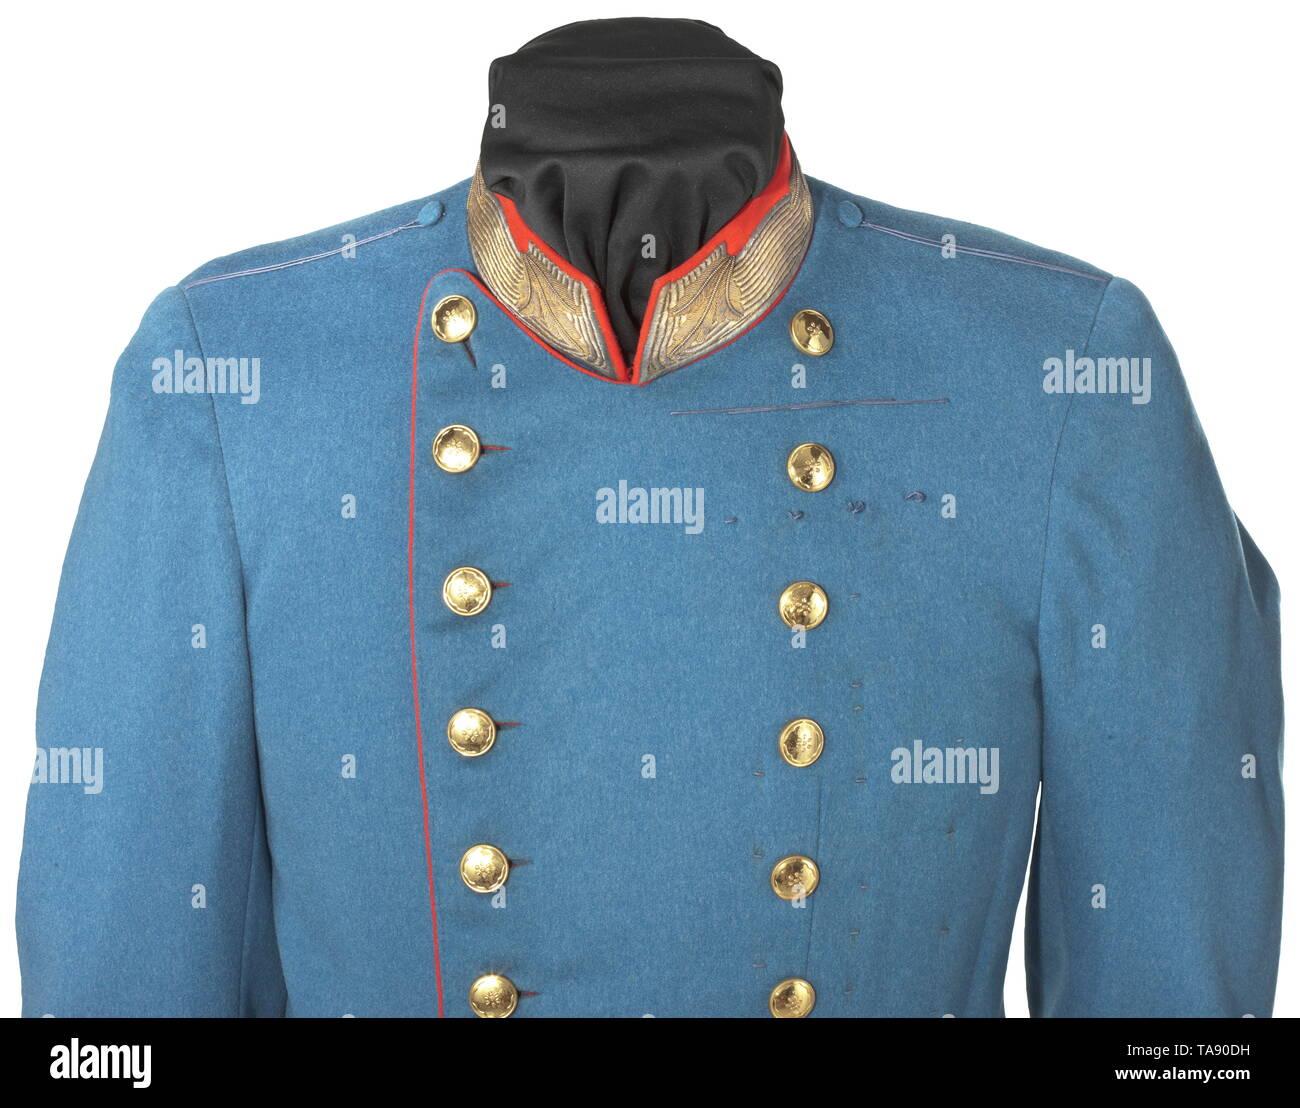 Kaiser Franz Joseph I High Resolution Stock Photography and Images - Alamy